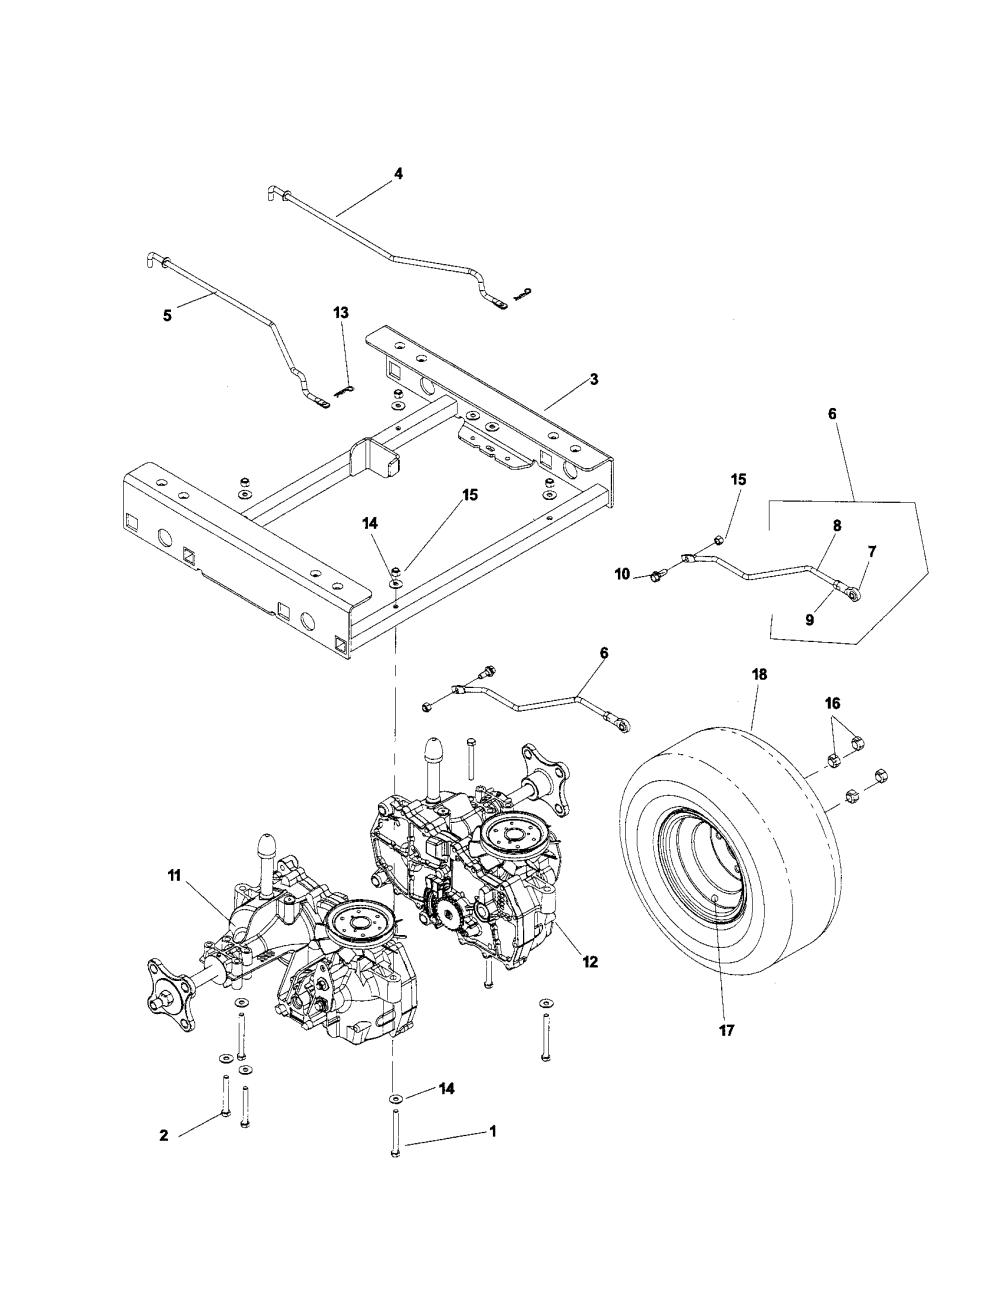 medium resolution of wiring diagram for husqvarna rz5426 husqvarna lawn mowers husqvarna rz4623 966764501 drive belt diagram husqvarna rz4623 pulley